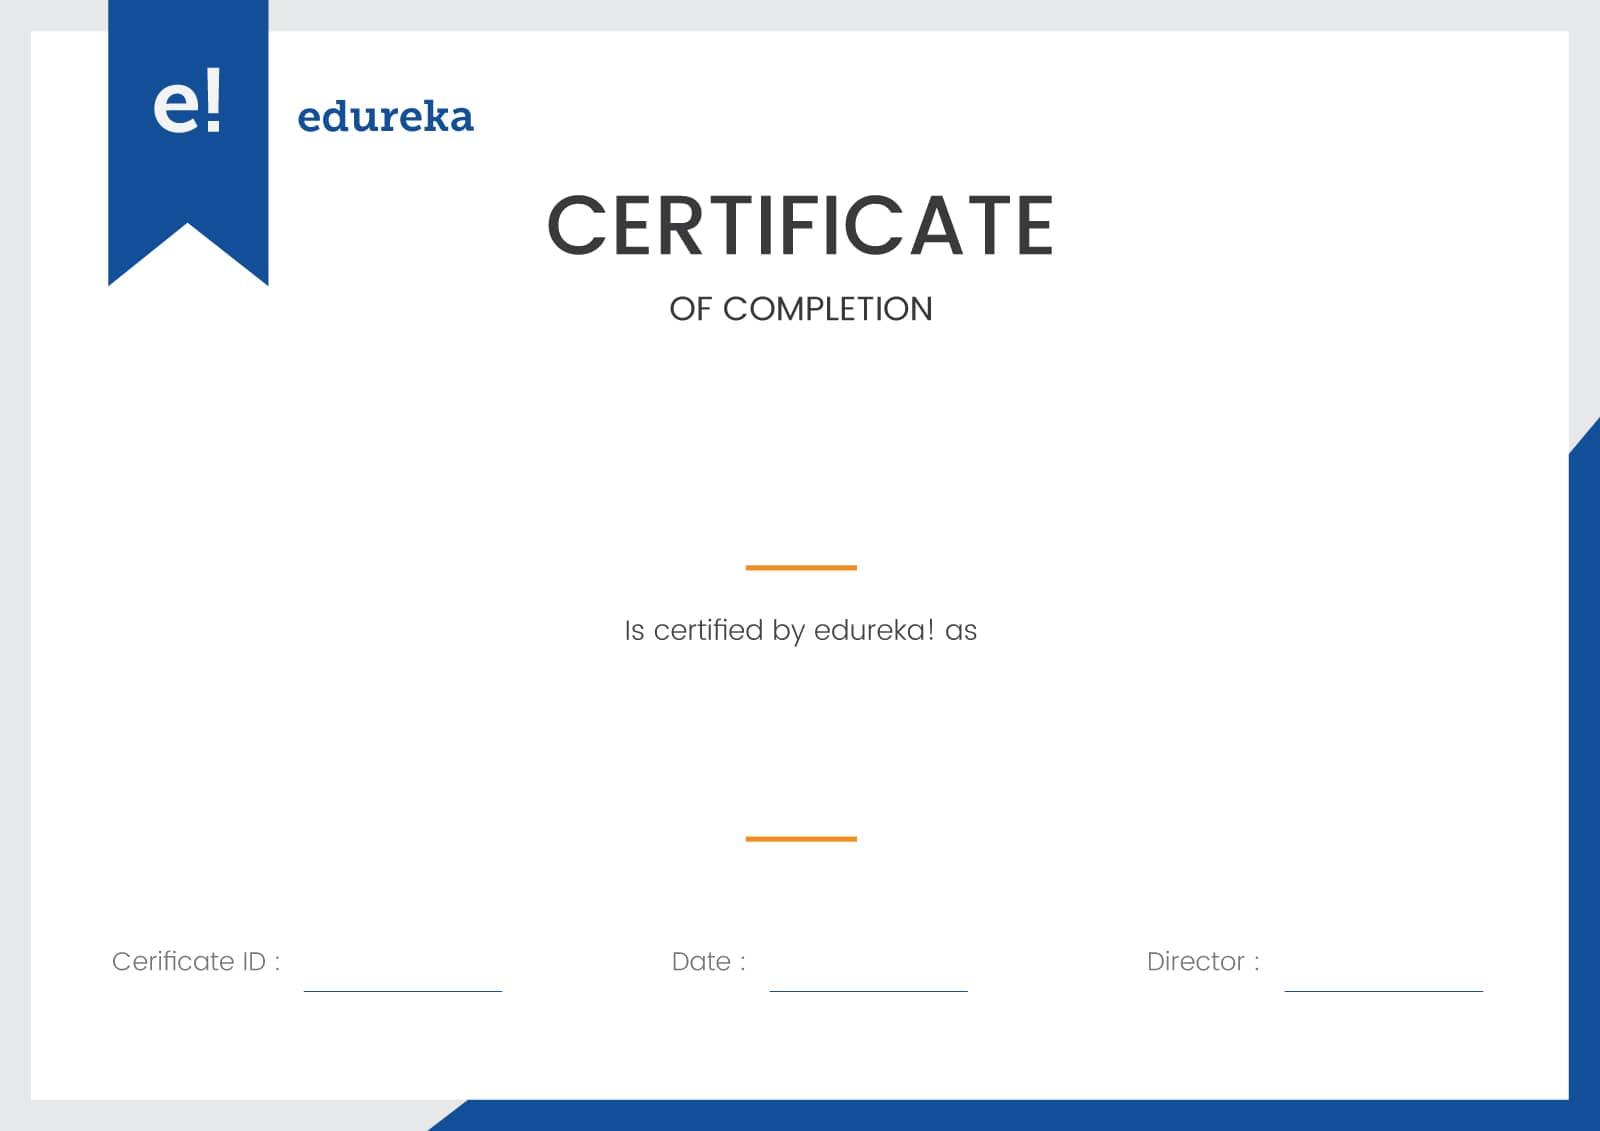 sapmle certificate